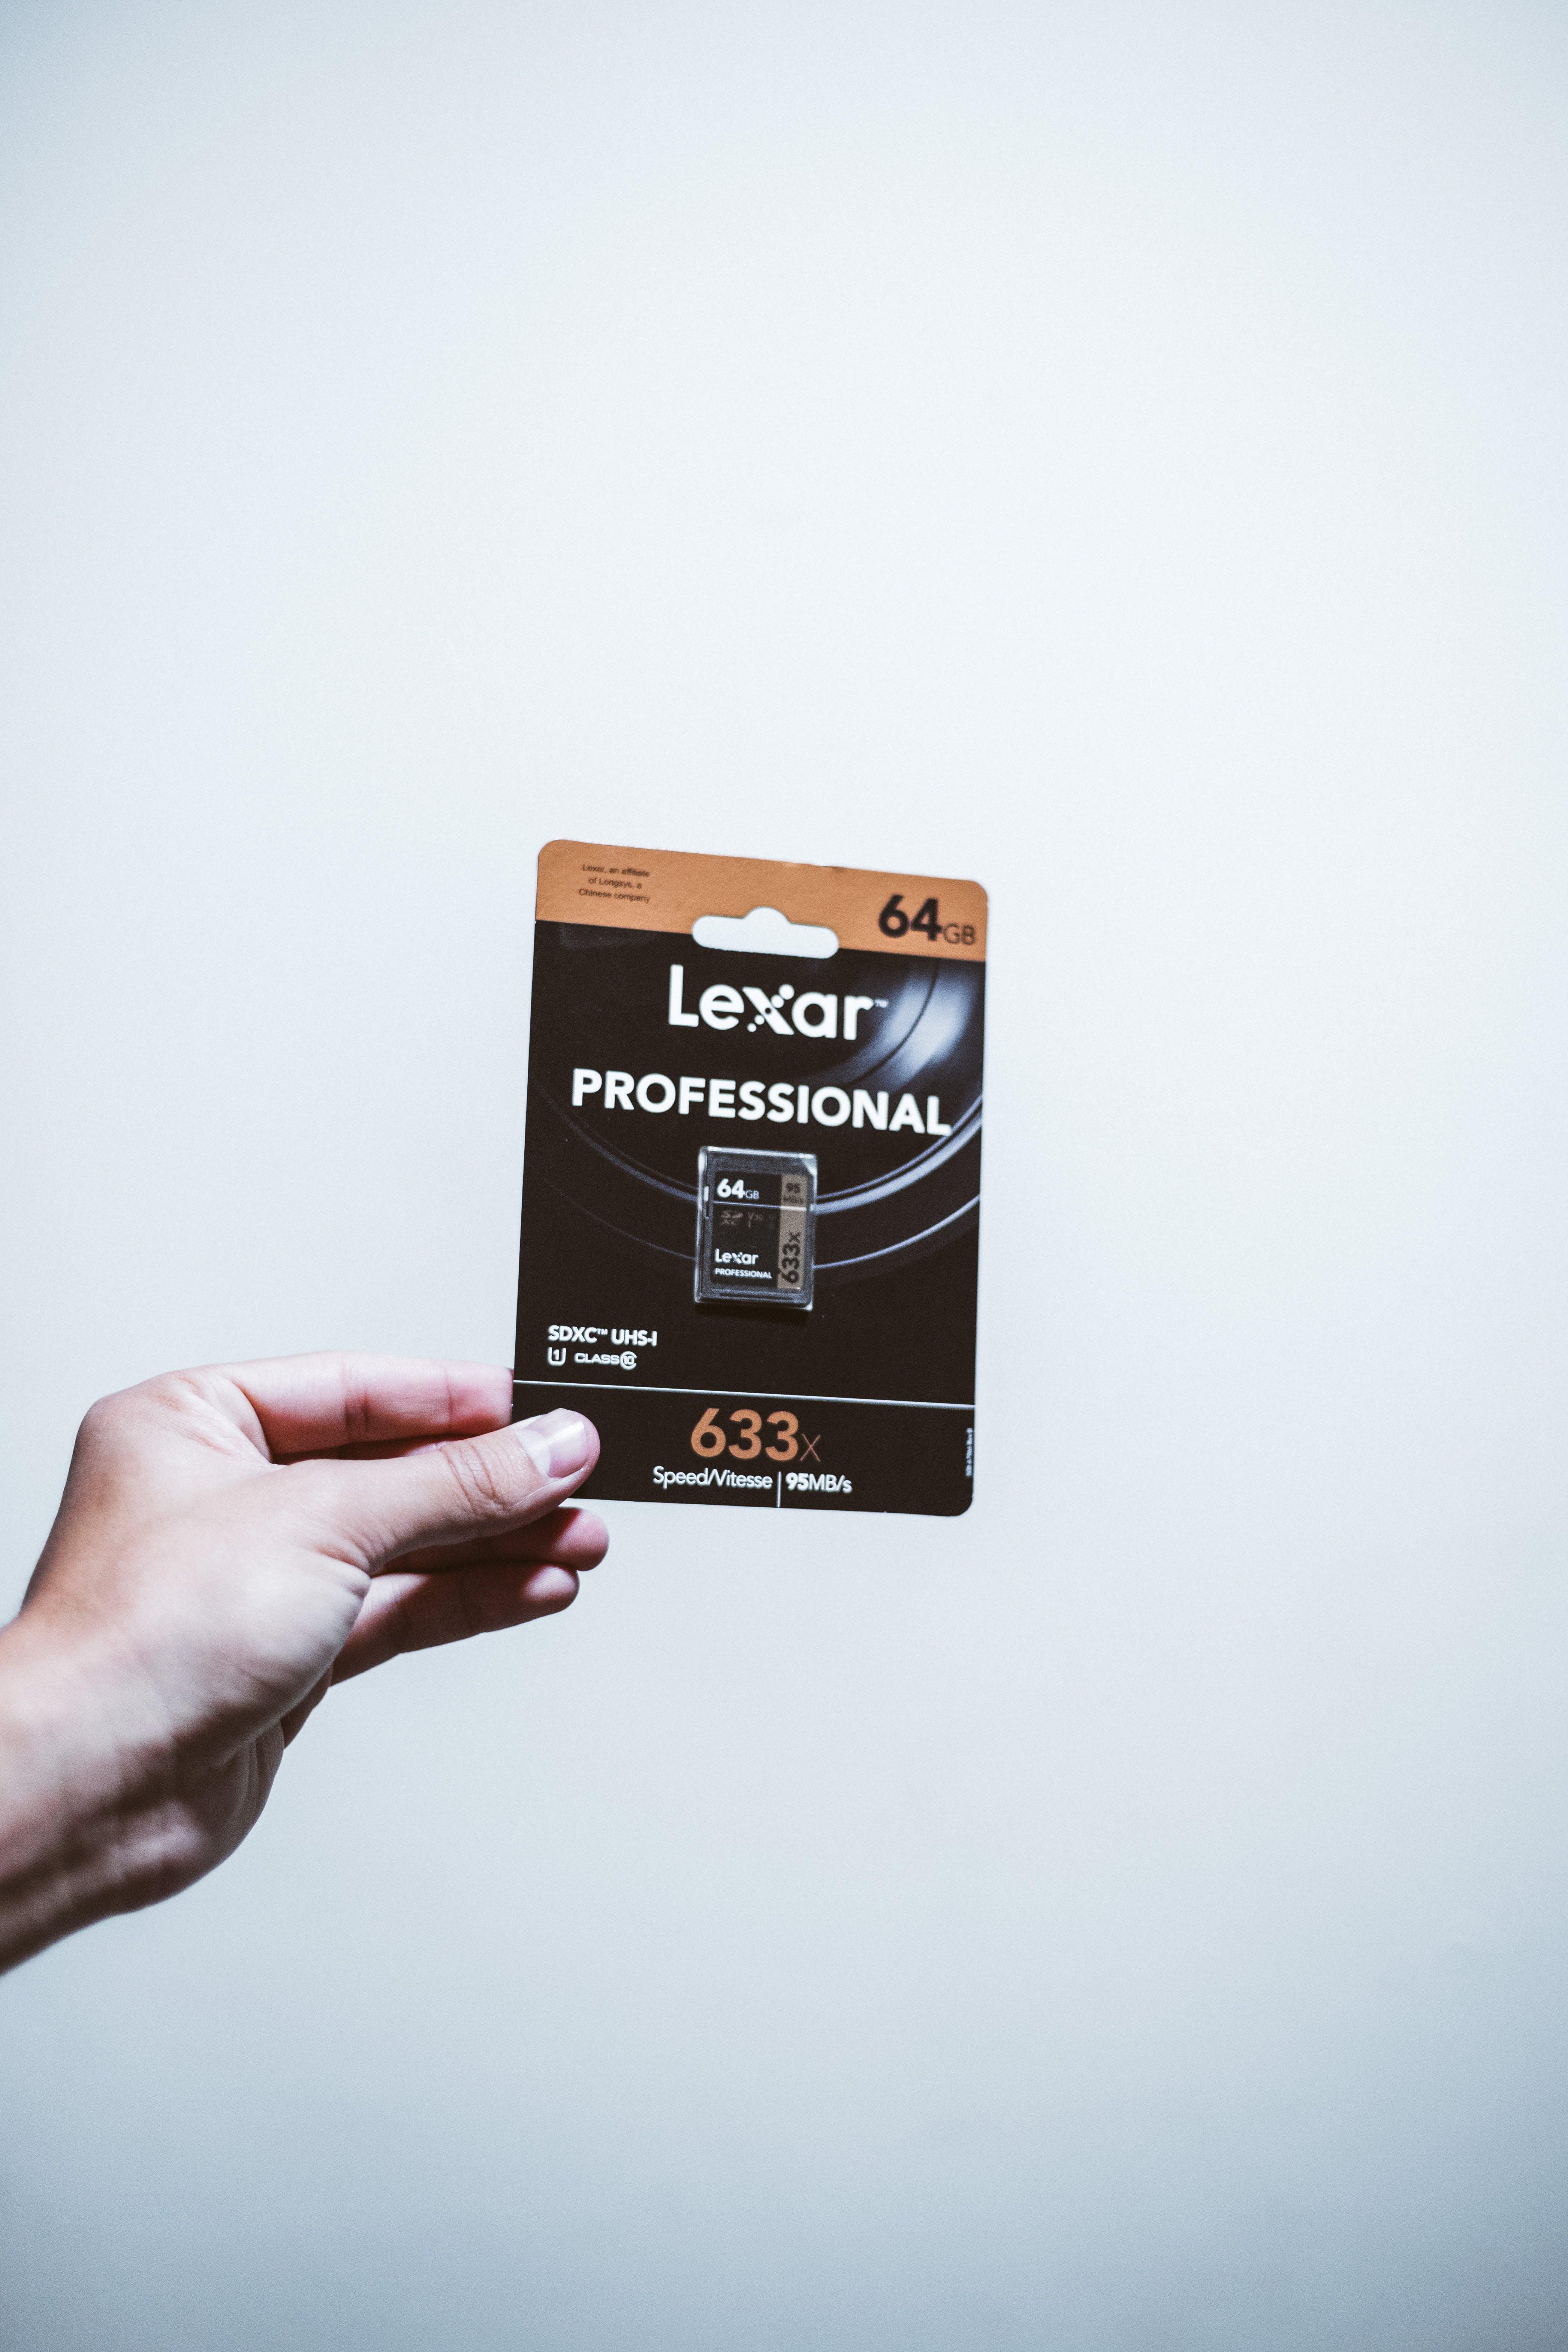 64gb Lexar Macro Card Pack